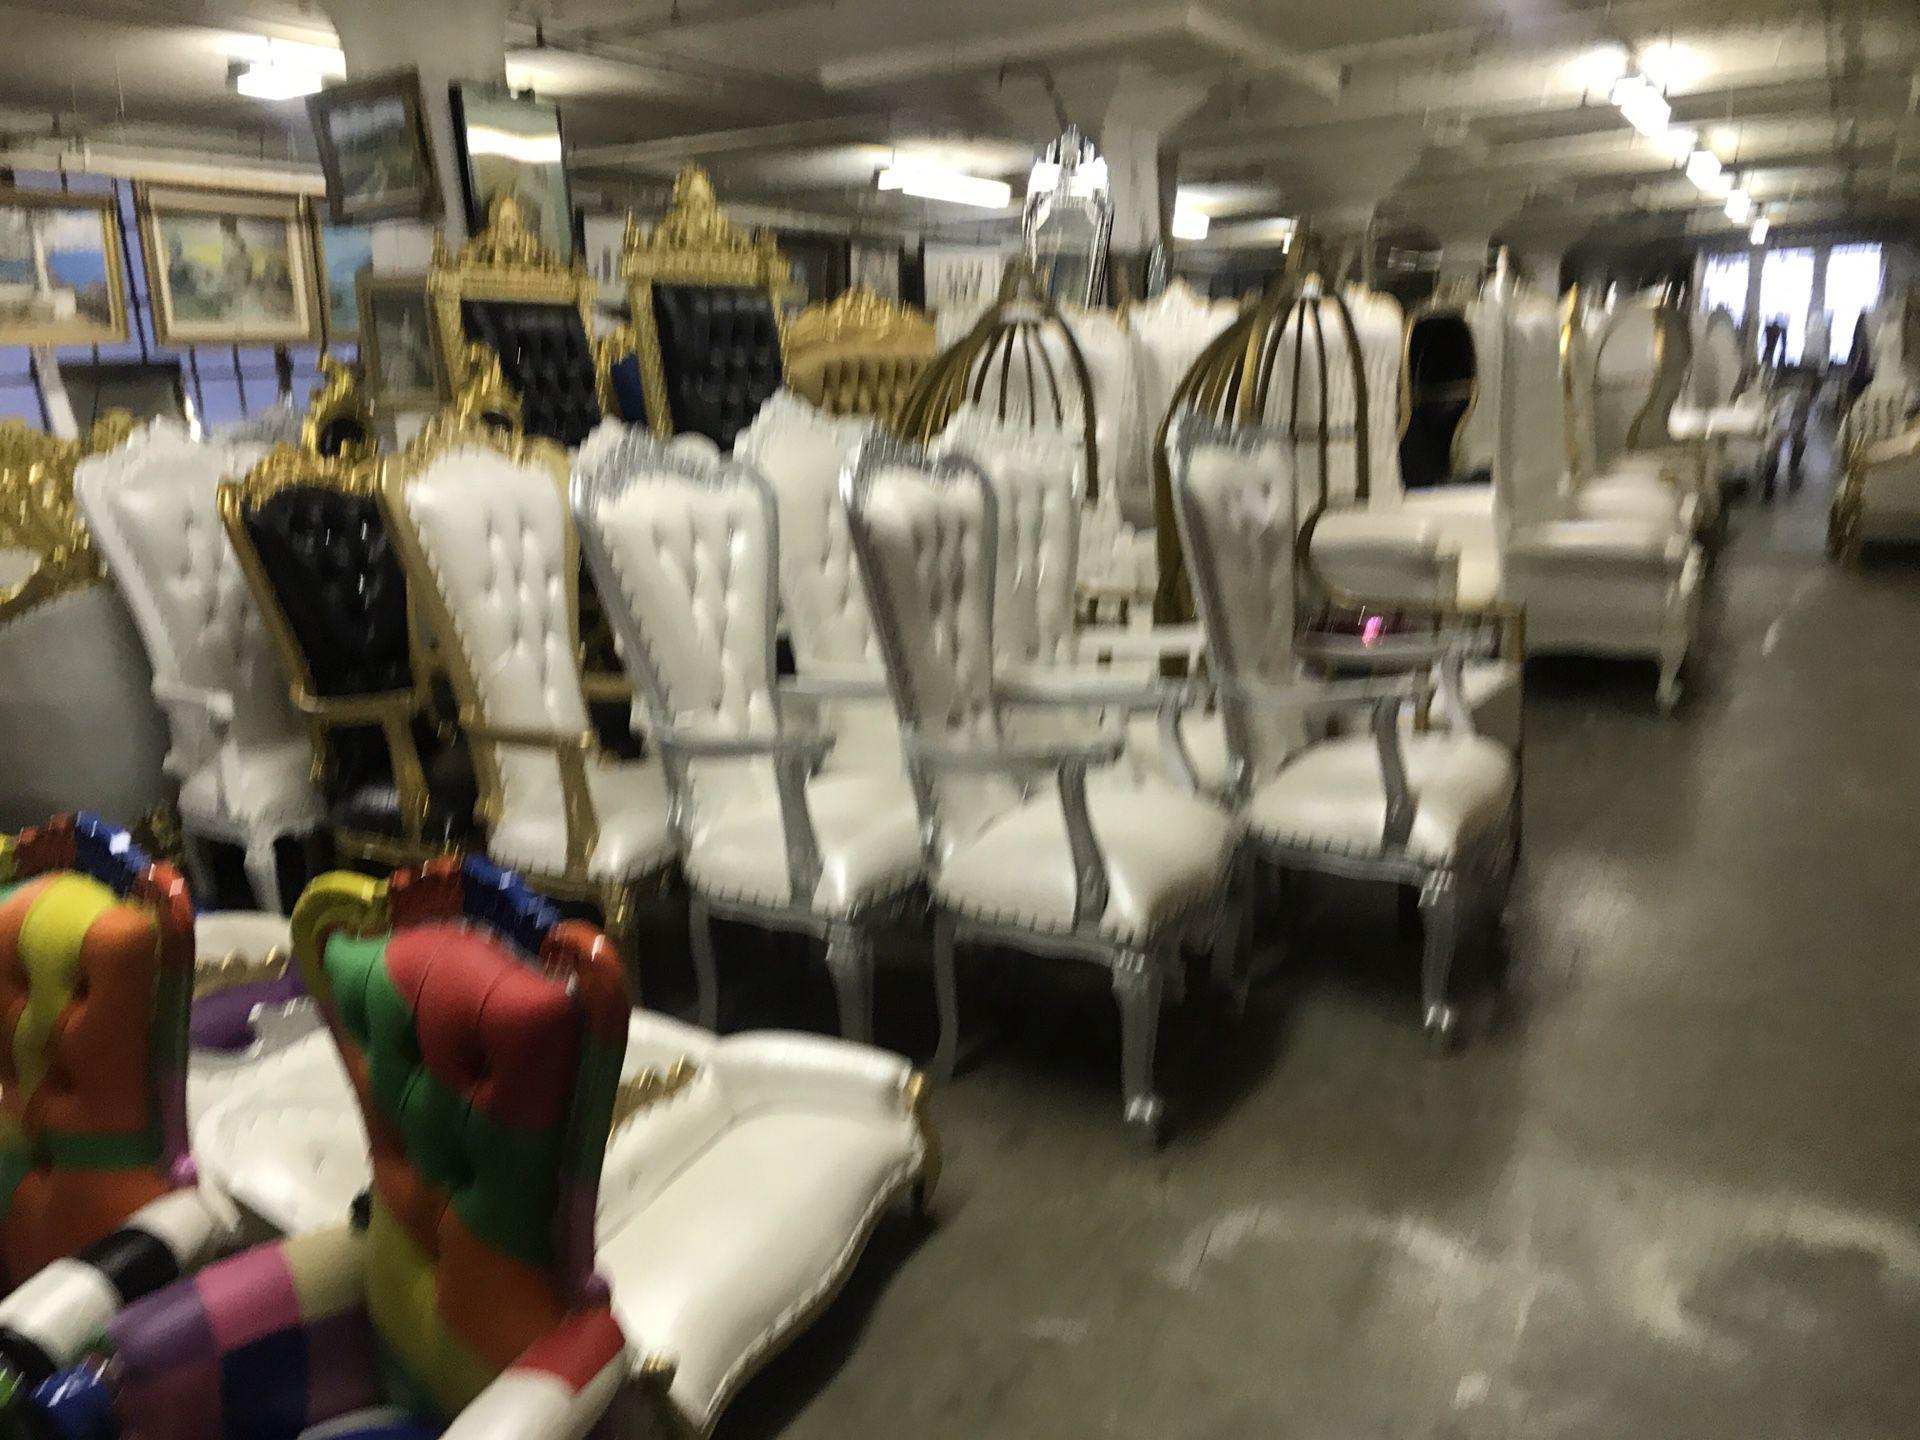 Beautiful throne chair.$1800 each. Best offer